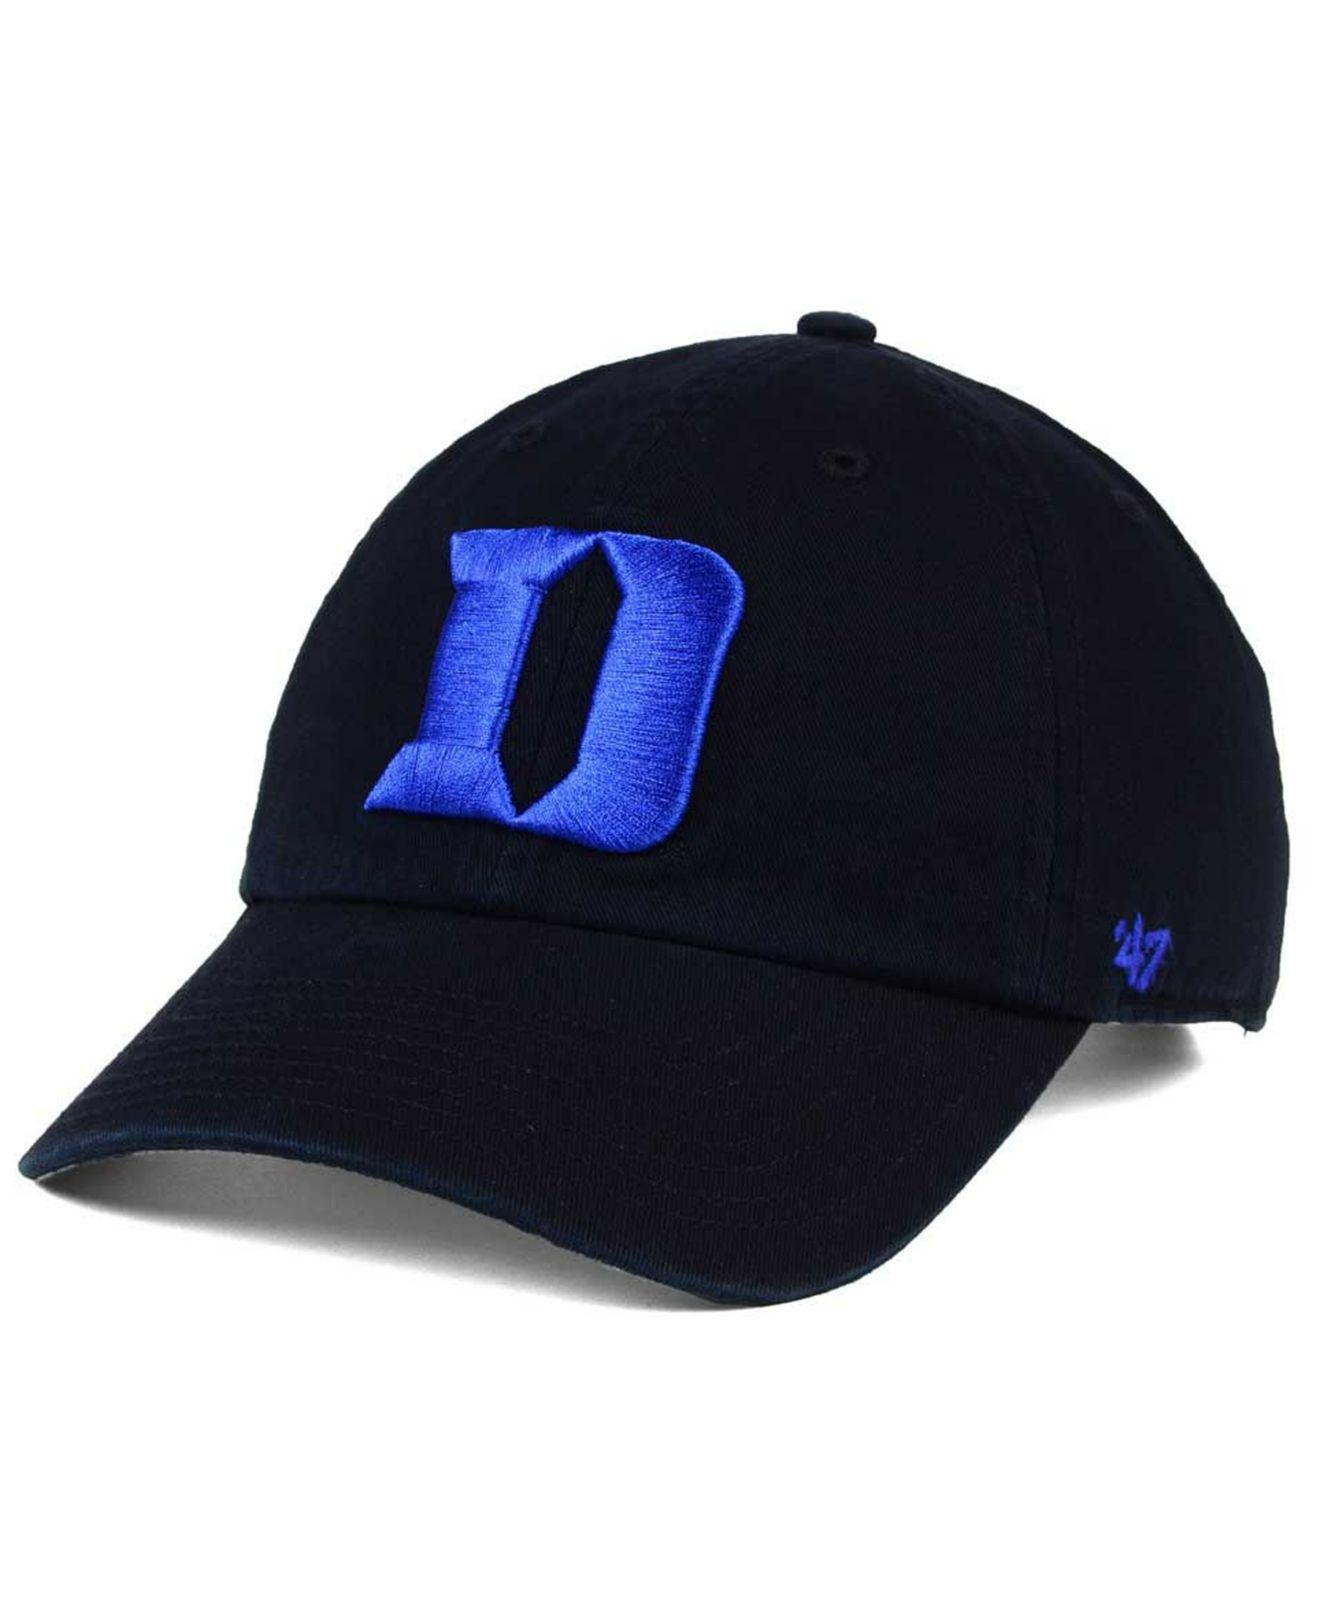 cheap for discount 30870 72773 ... where can i buy 47 brand. mens black duke blue devils clean up cap 52c1f